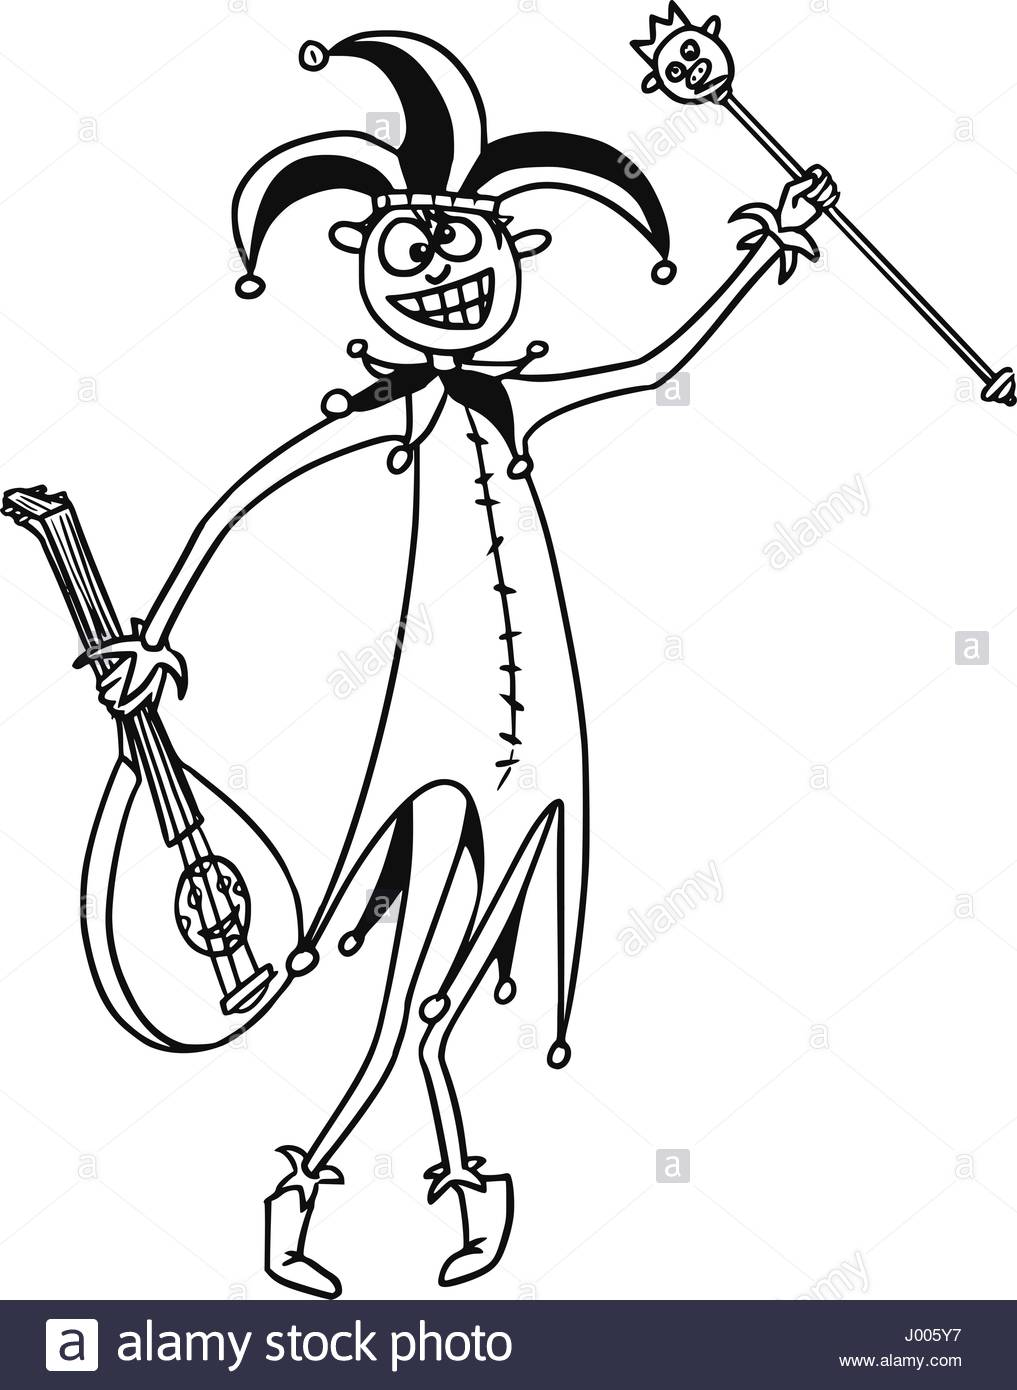 1017x1390 Cartoon Vector Fantasy Medieval Jester Fool Clown Buffoon With Hat